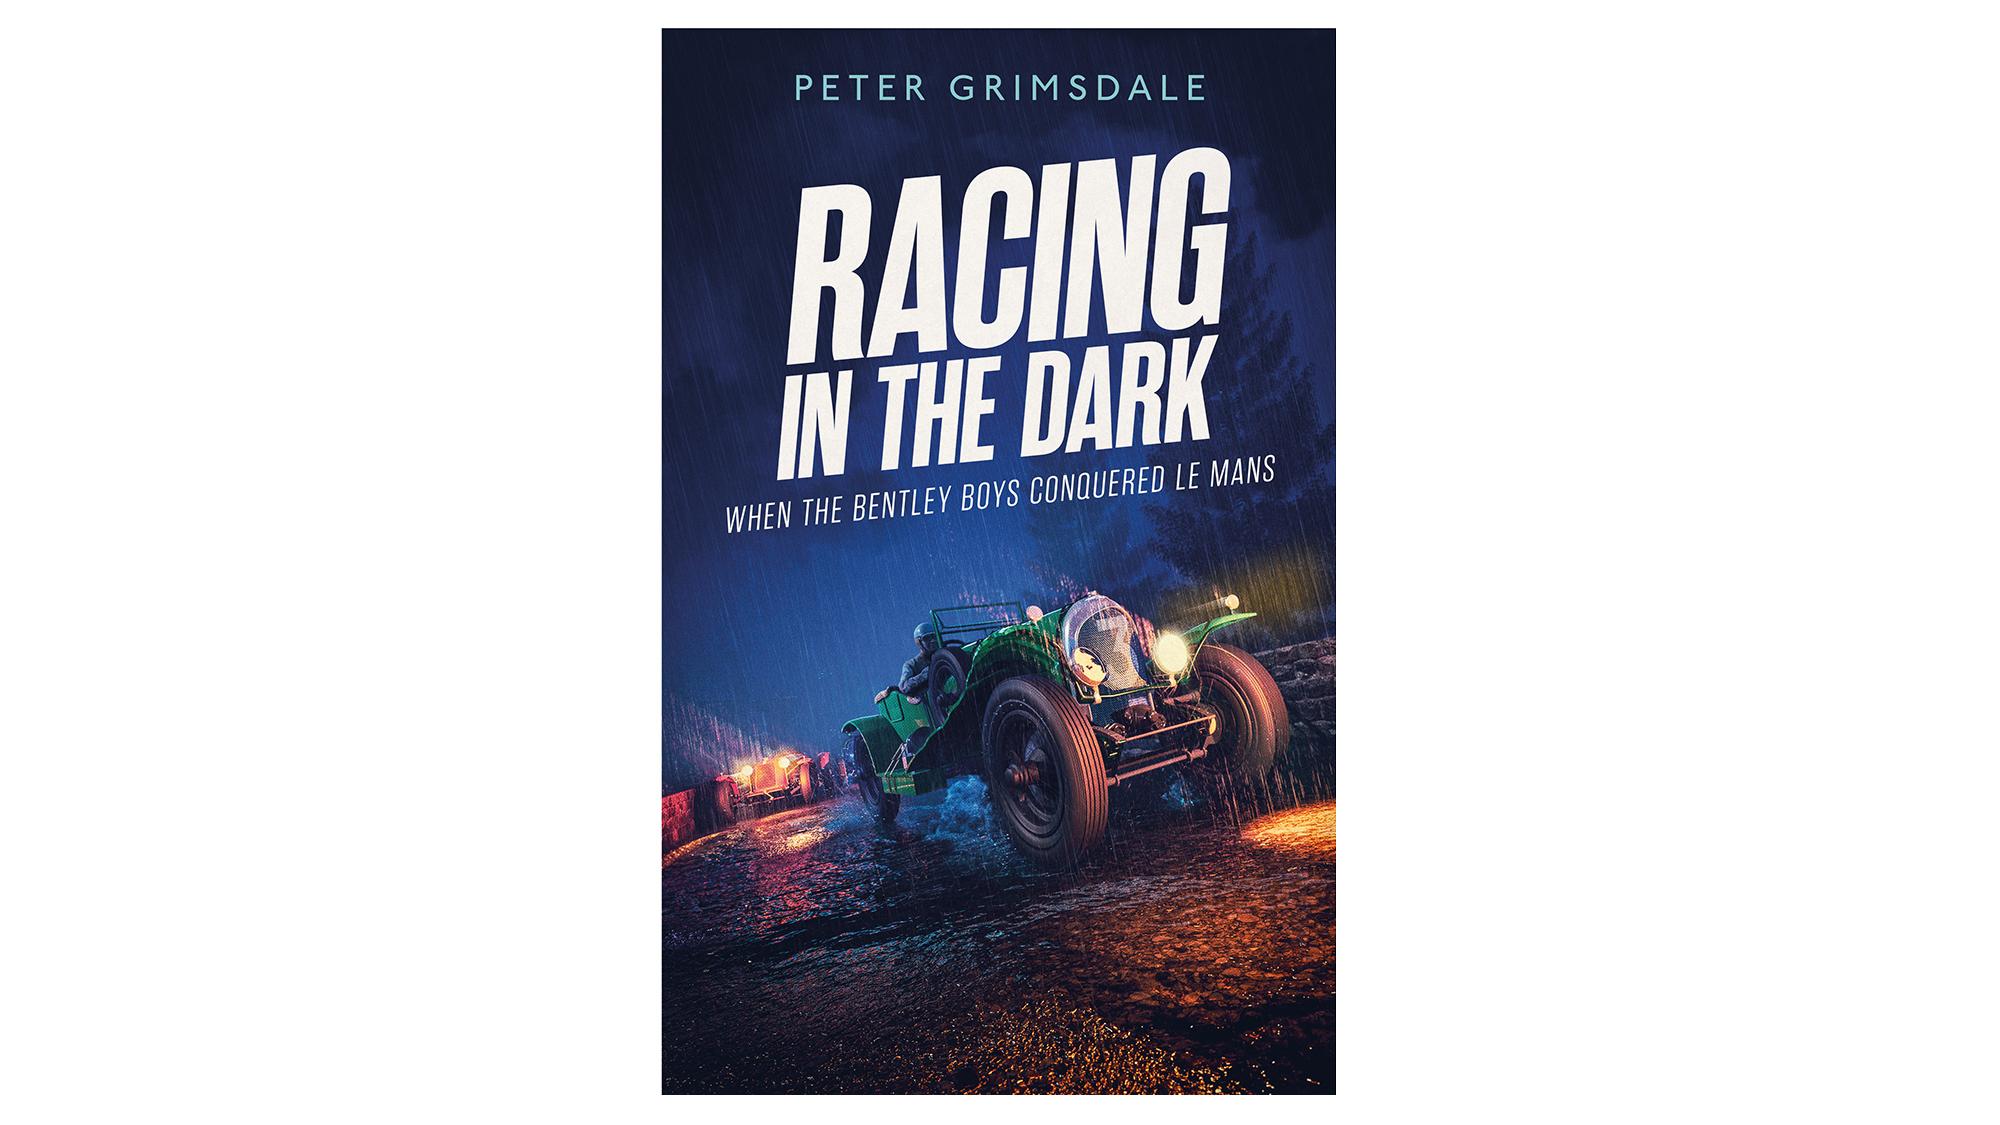 Racing in the dark book